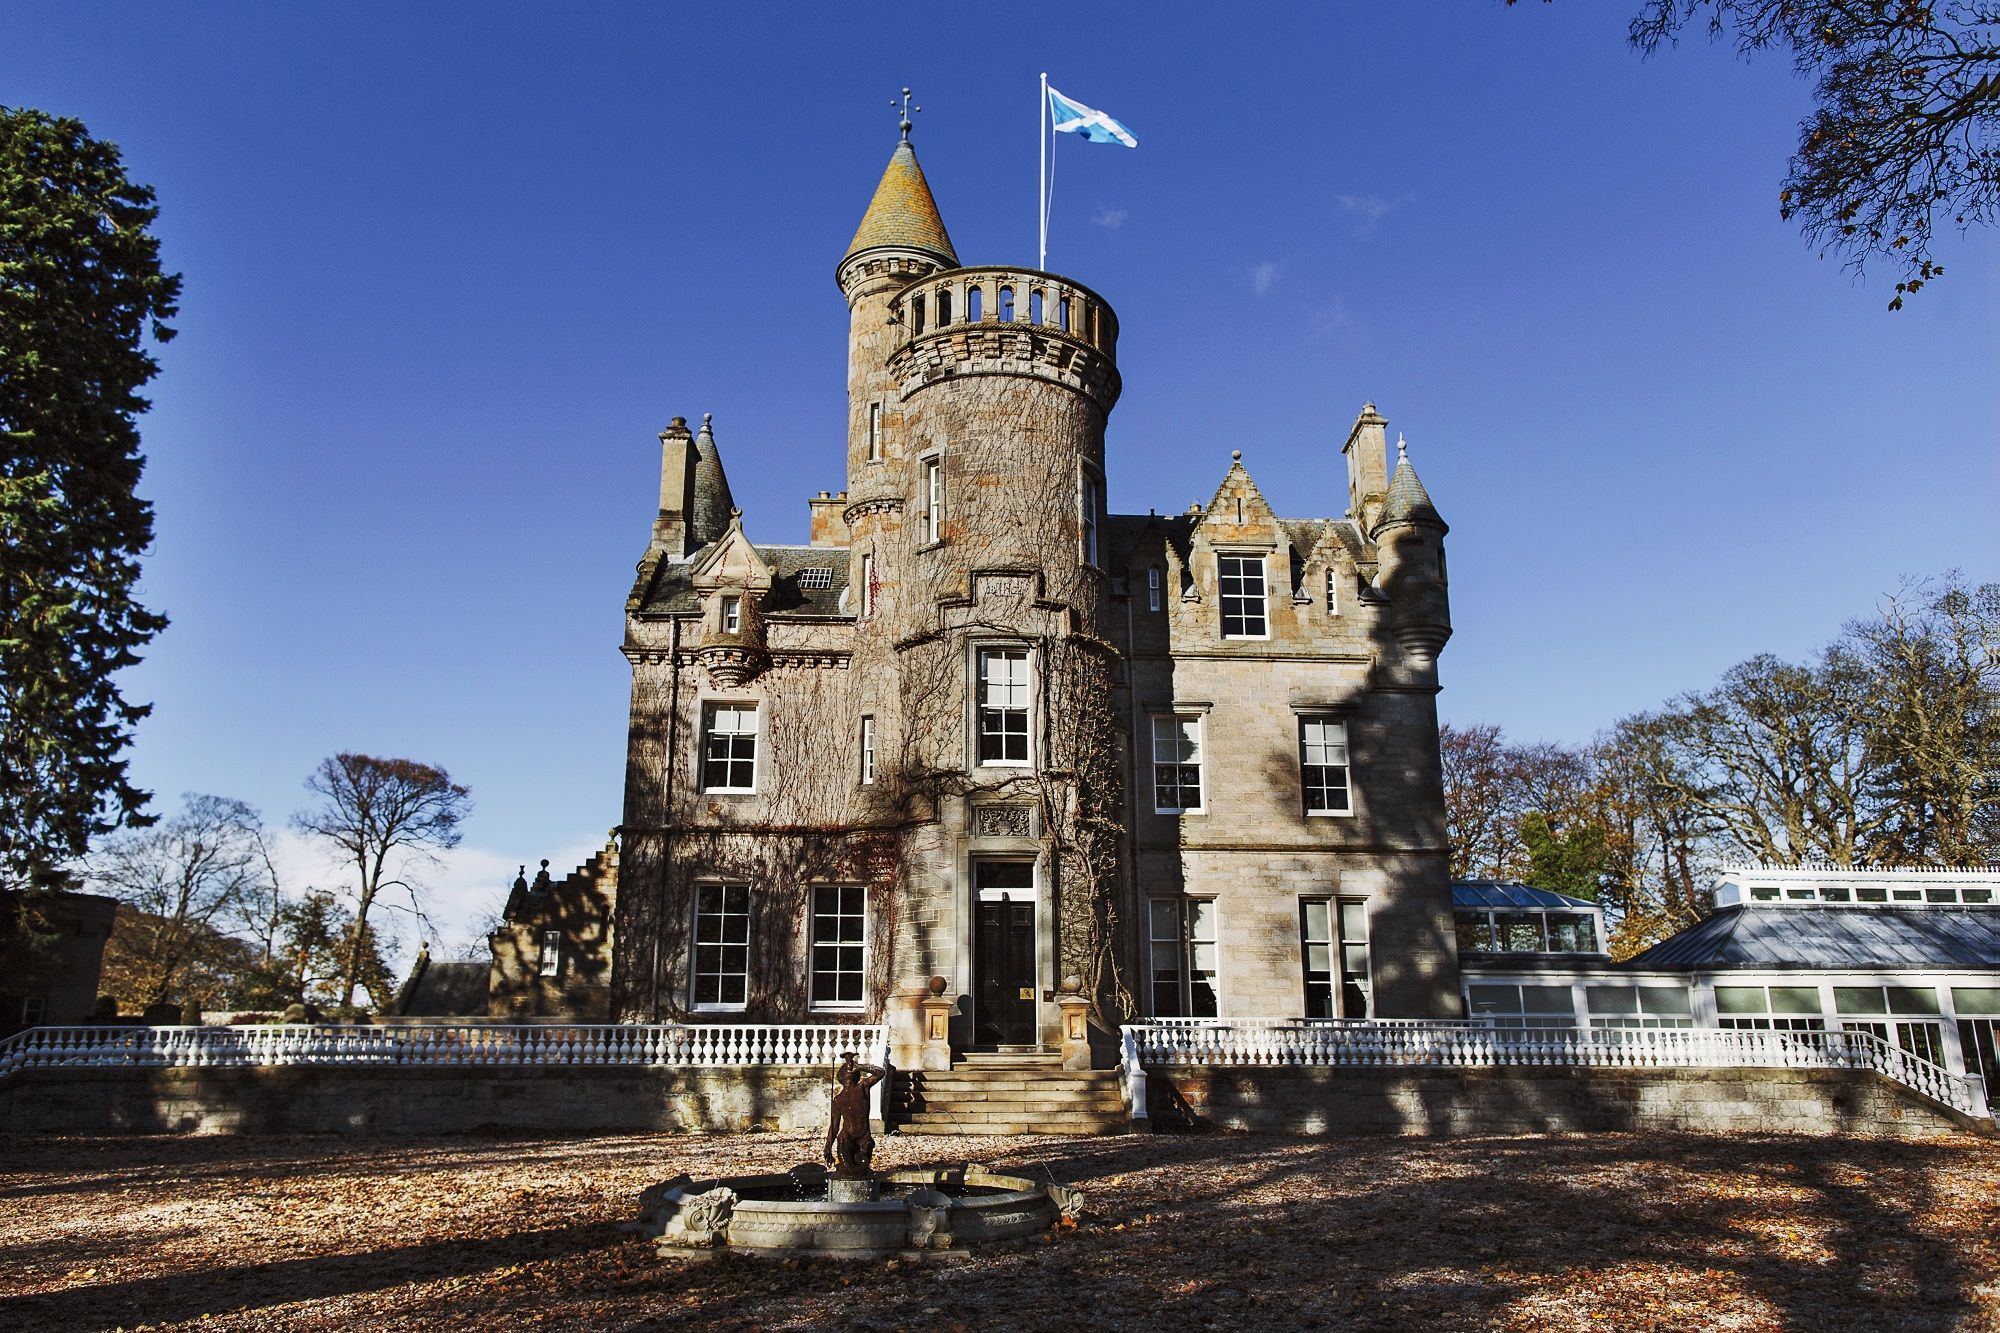 Carlowrie Castle A Luxury Exclusive Use In Kirkliston Edinburgh Scotland Unique Wedding Venue On The Edge Of Scotlands Capital City